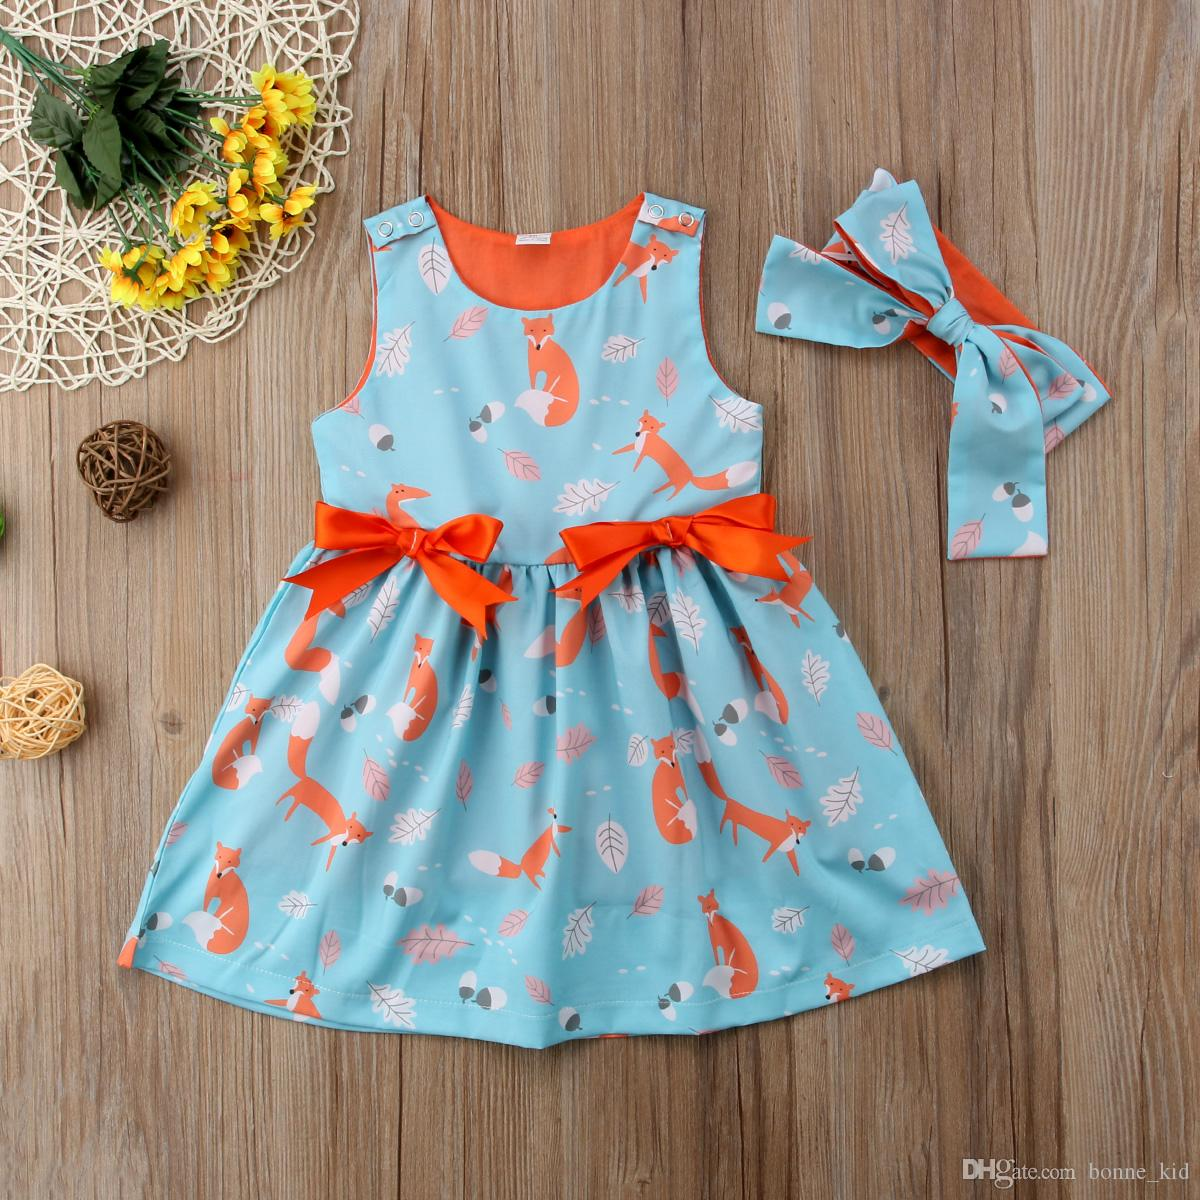 2018 animal fox kids girls orange blueprincess dresses sleeveless bowknot tutu dresses baby girl clothes 12M-6Y high quality summer products